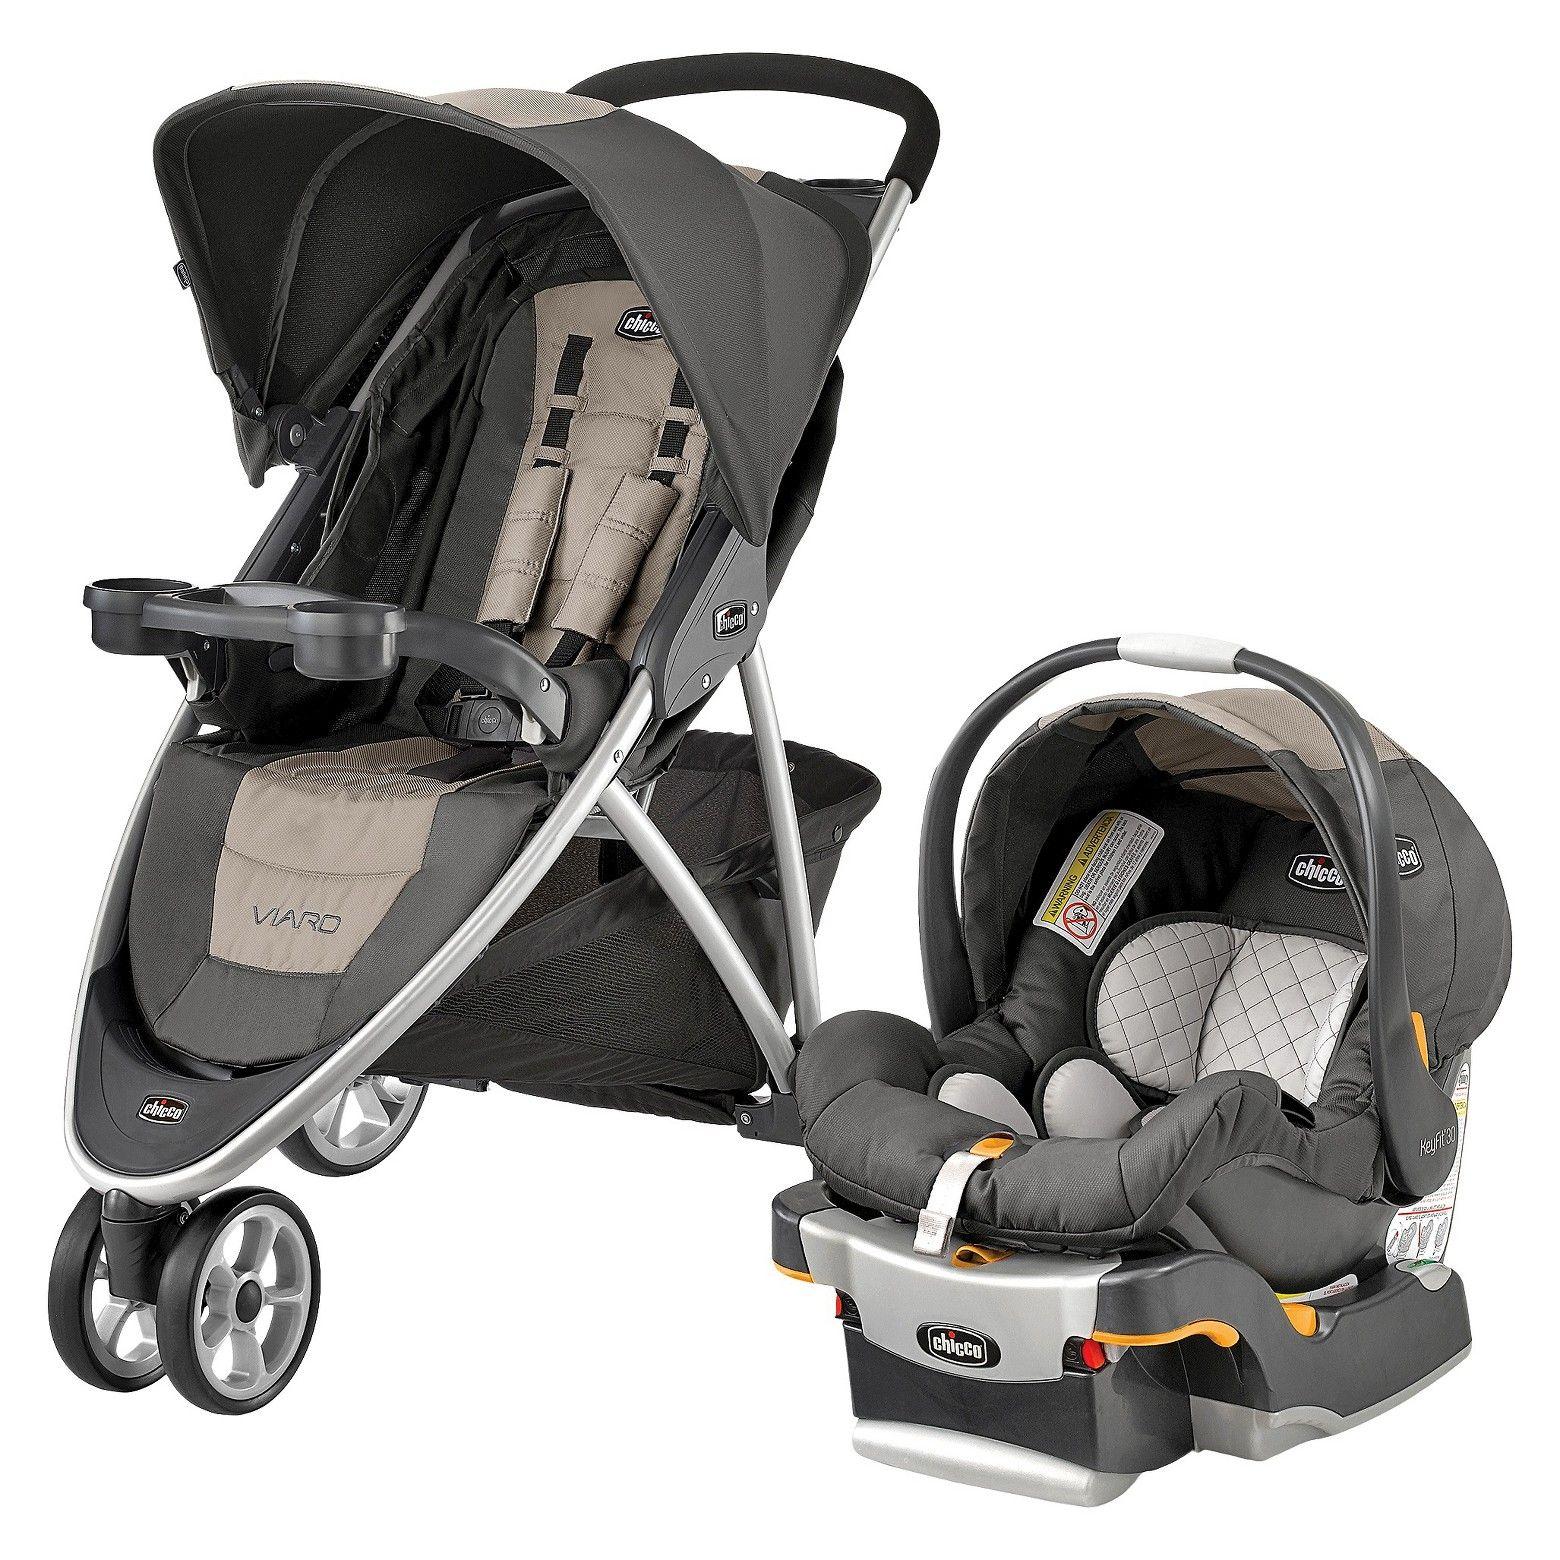 Chicco Viaro Travel System Baby car seats, Travel system